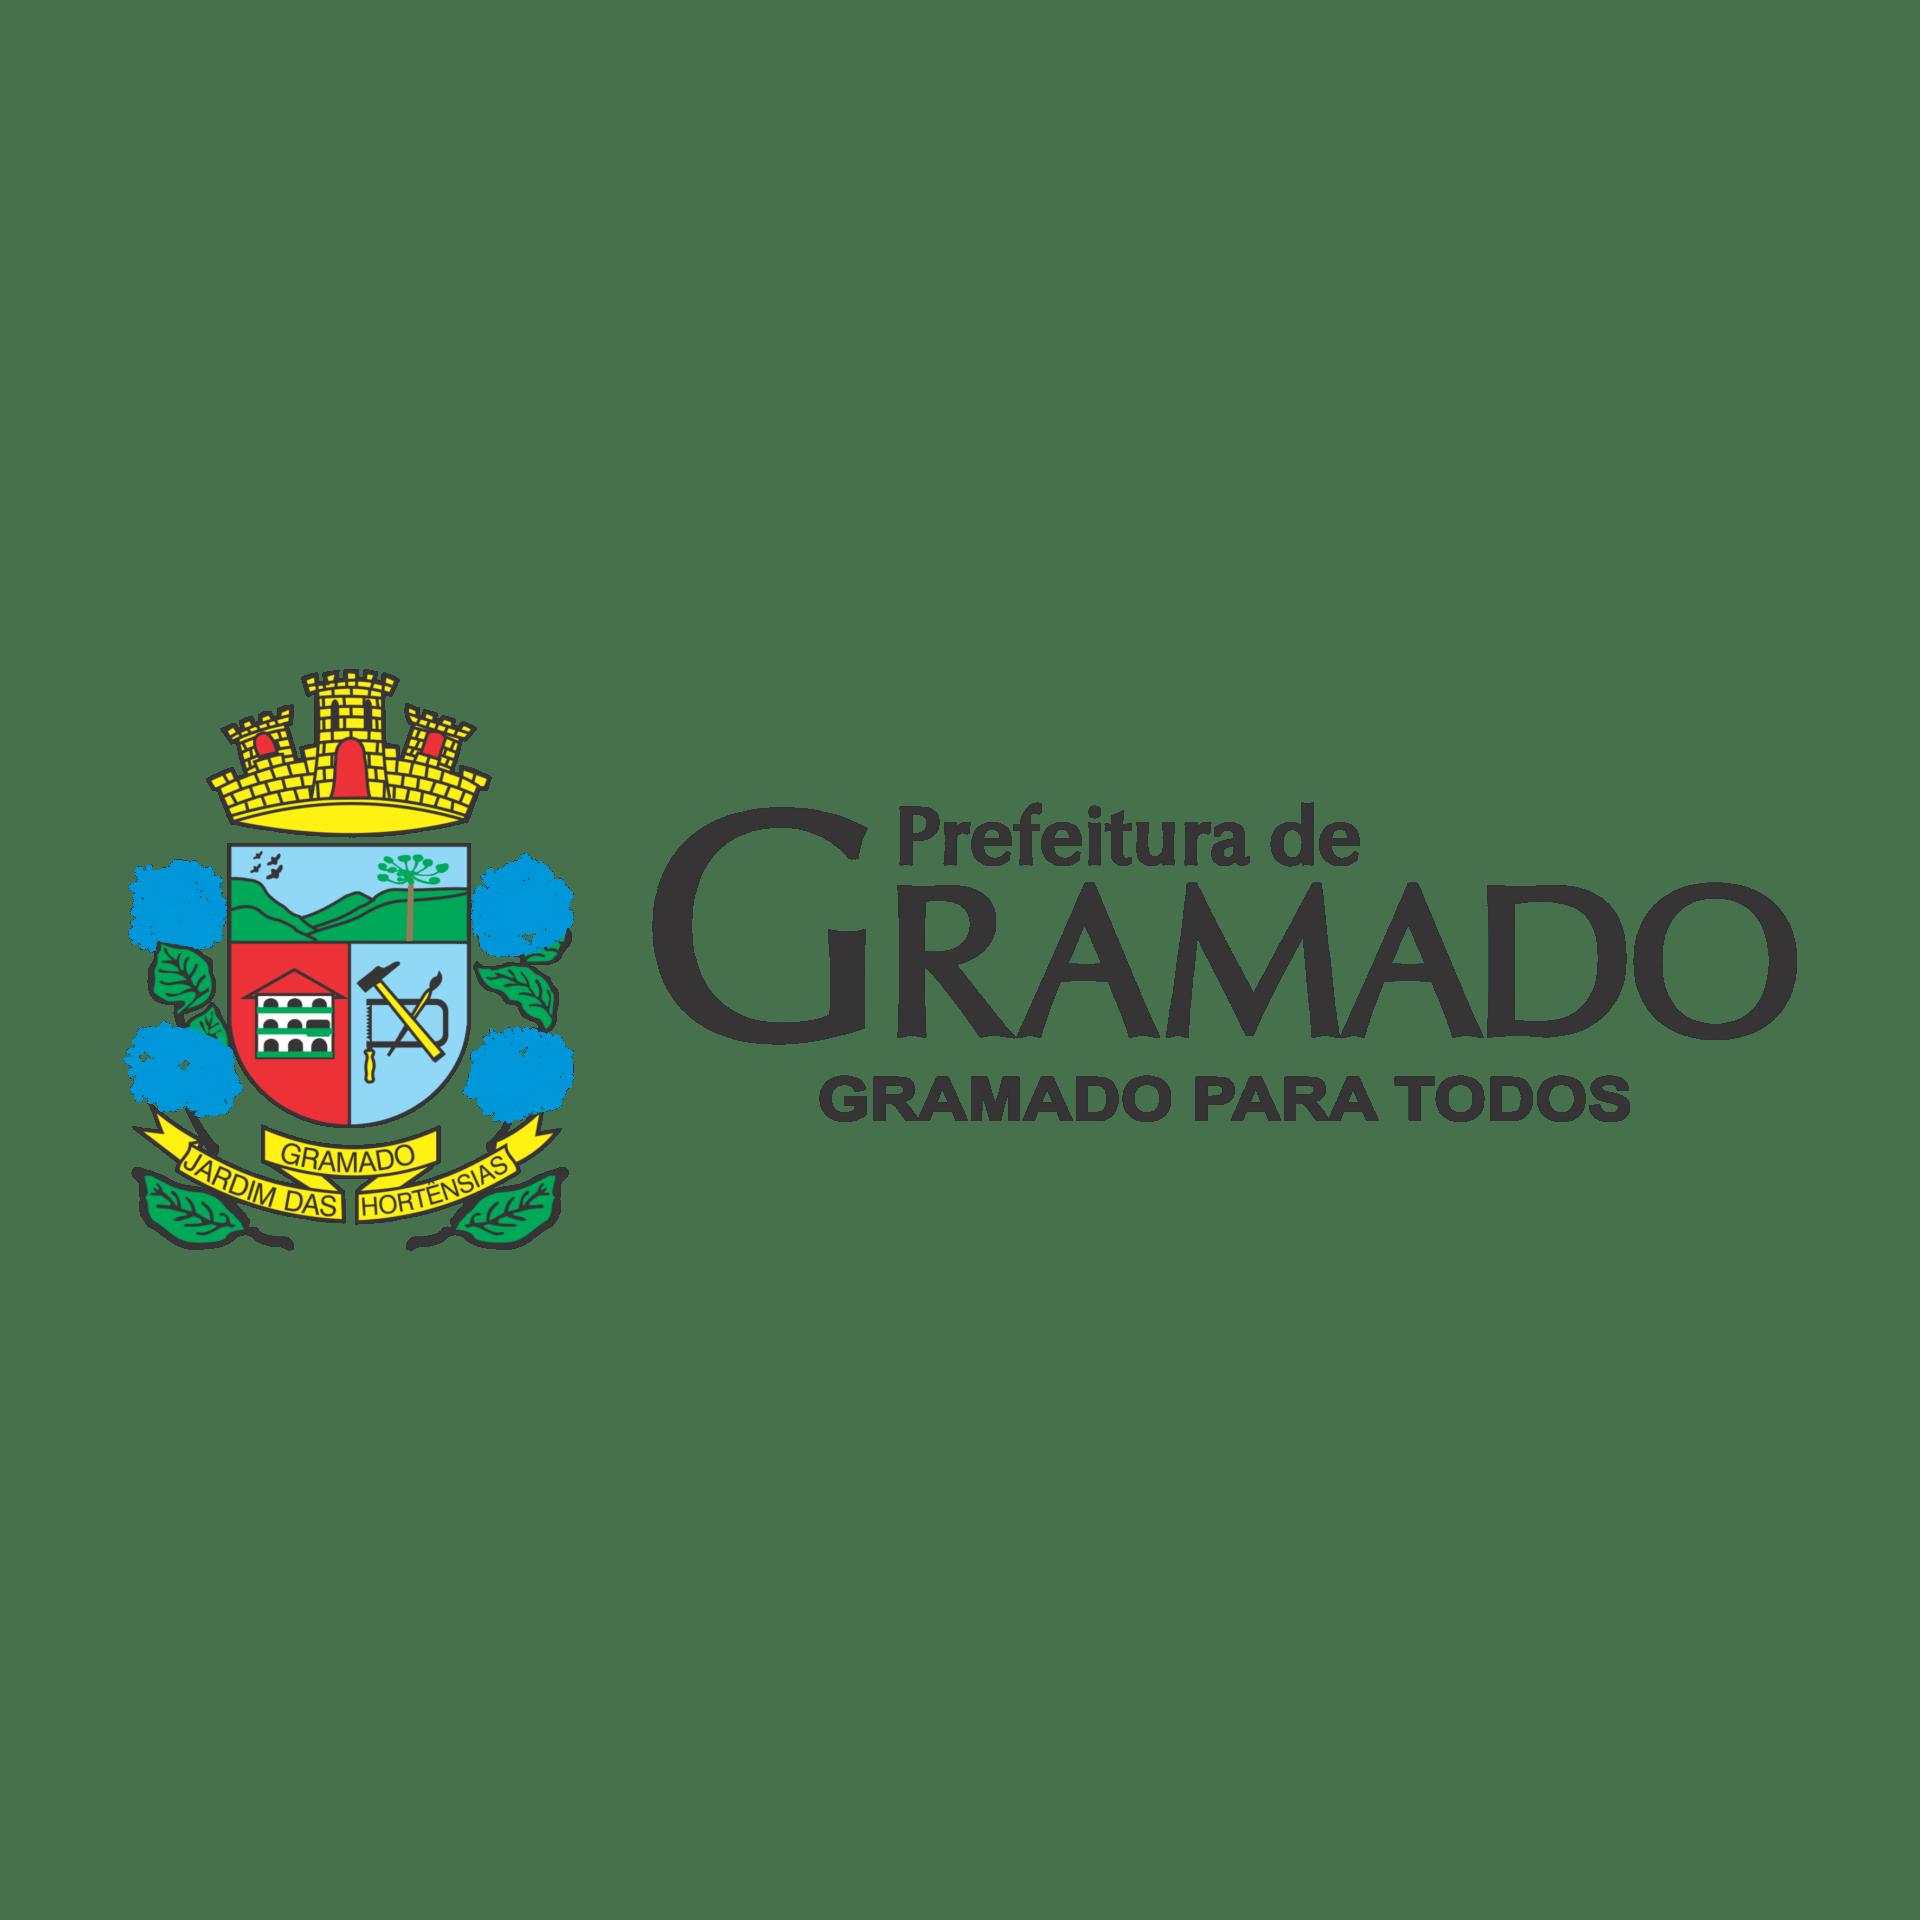 PREFEITURA GRAMADO